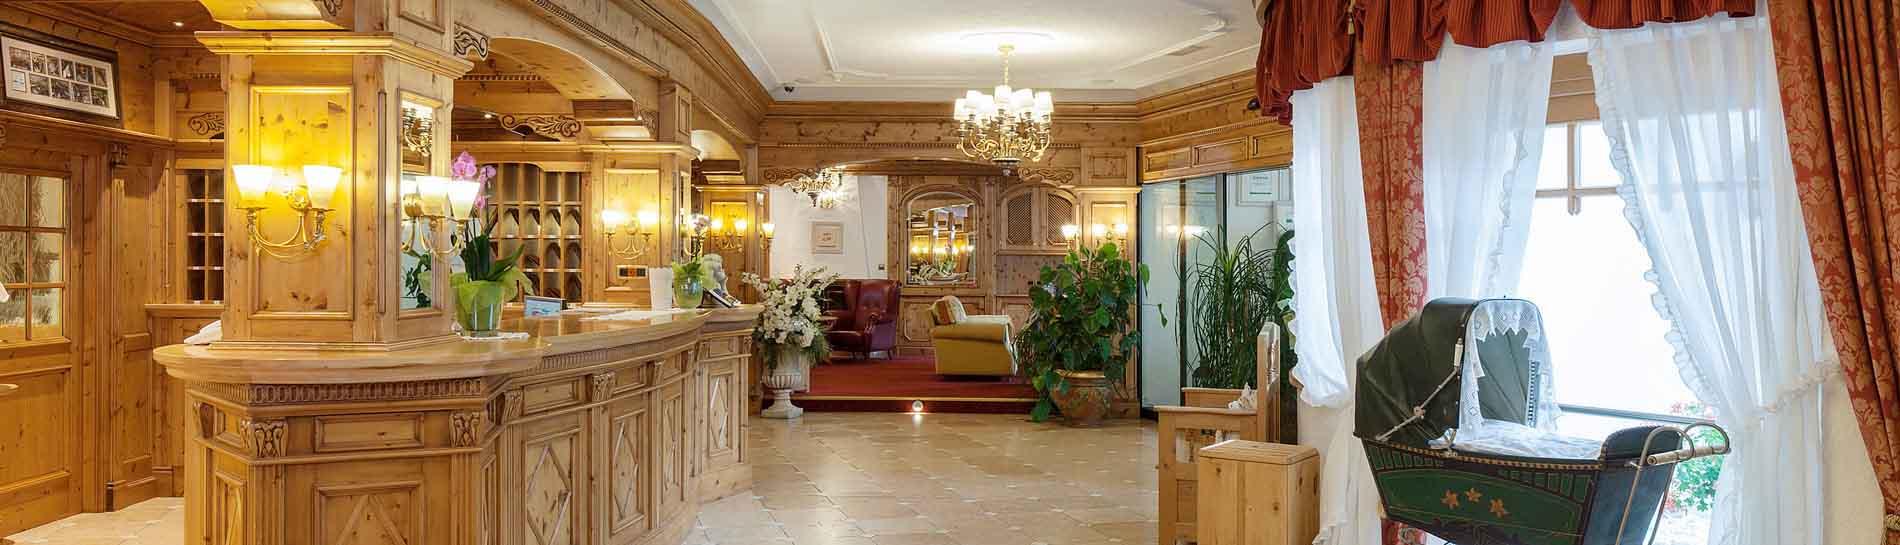 Plunhof Ridnaun South Tyrol Italy Spa Wellness Hotel